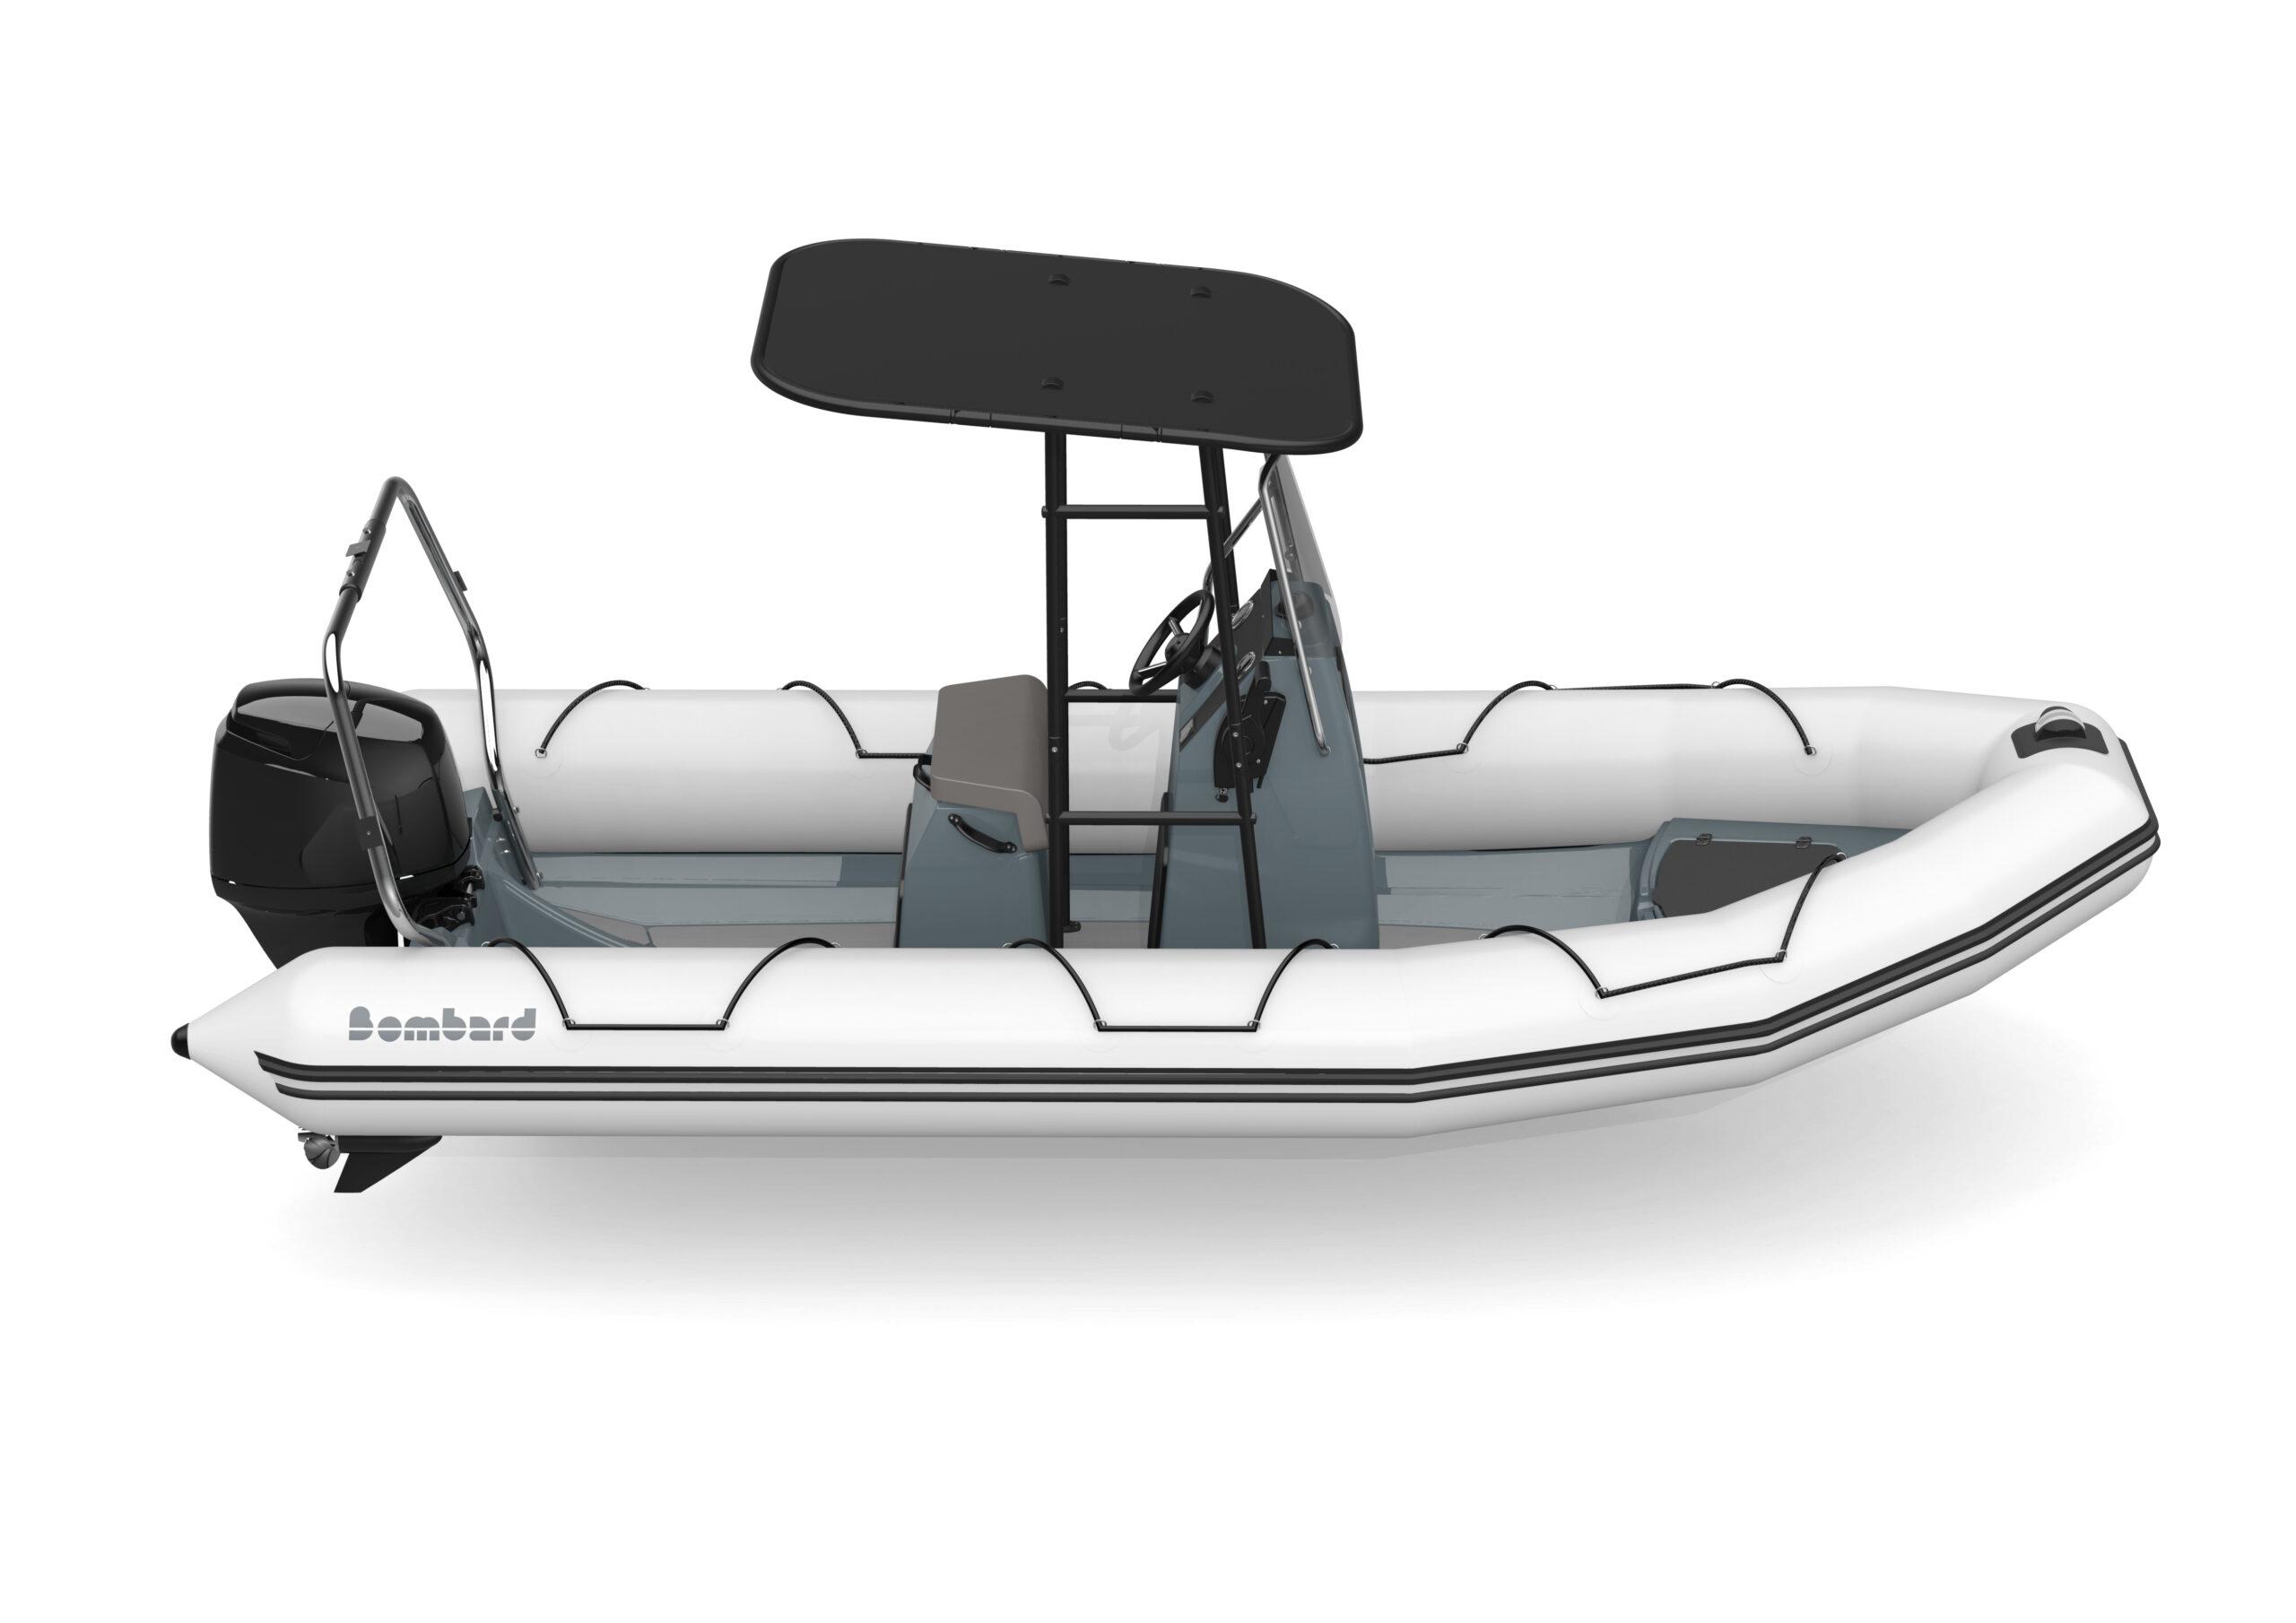 Bombard Explorer 550 light-eva P2 ttop